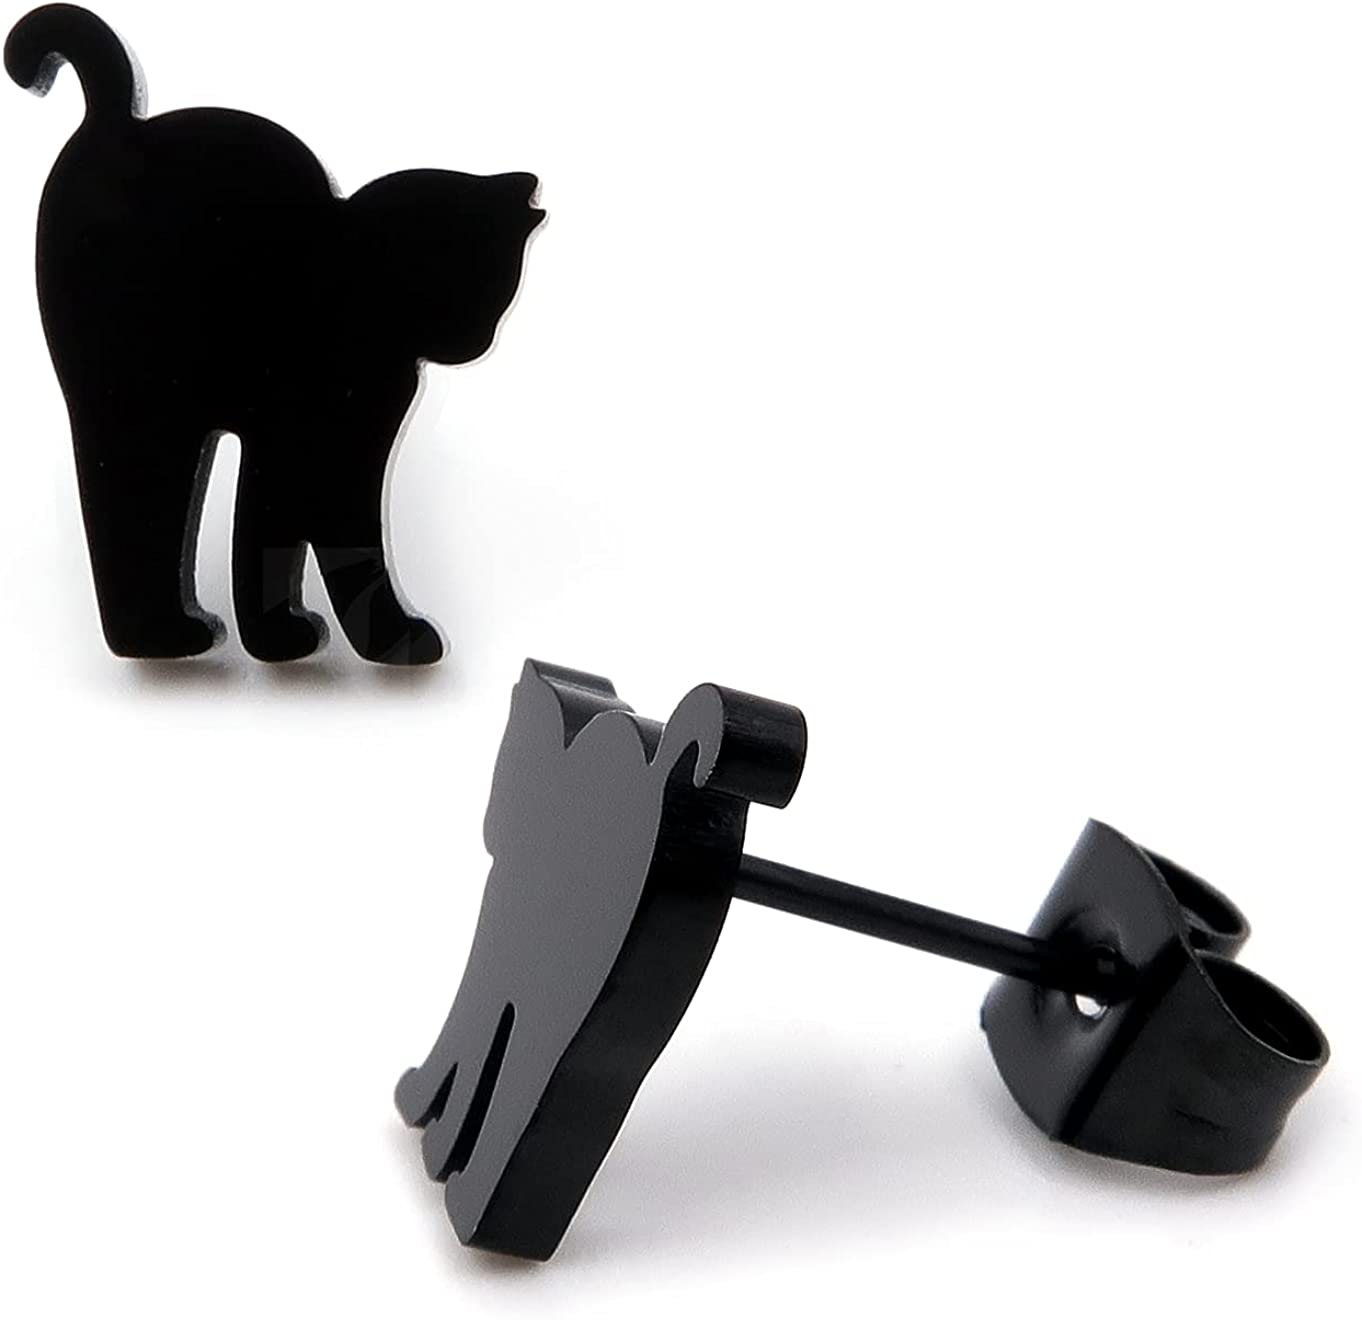 Steelmeup Stainless Steel Cute Black Cat Silhouette Post Stud Earrings Arch Back Cleaning